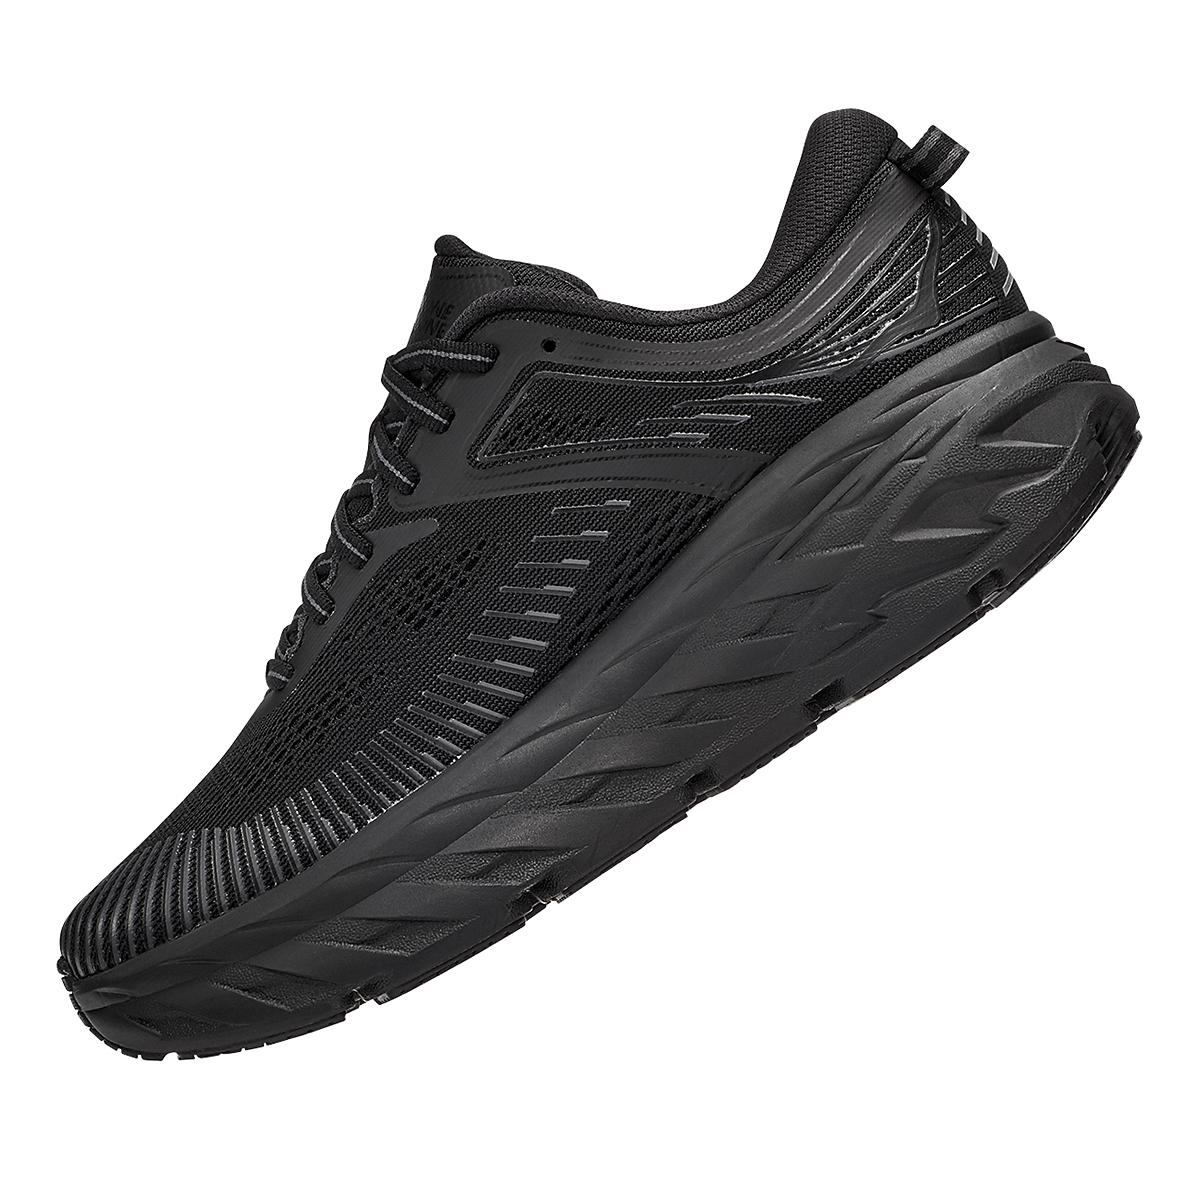 Women's Hoka One One Bondi 7 Running Shoe - Color: Black - Size: 5 - Width: Regular, Black, large, image 4